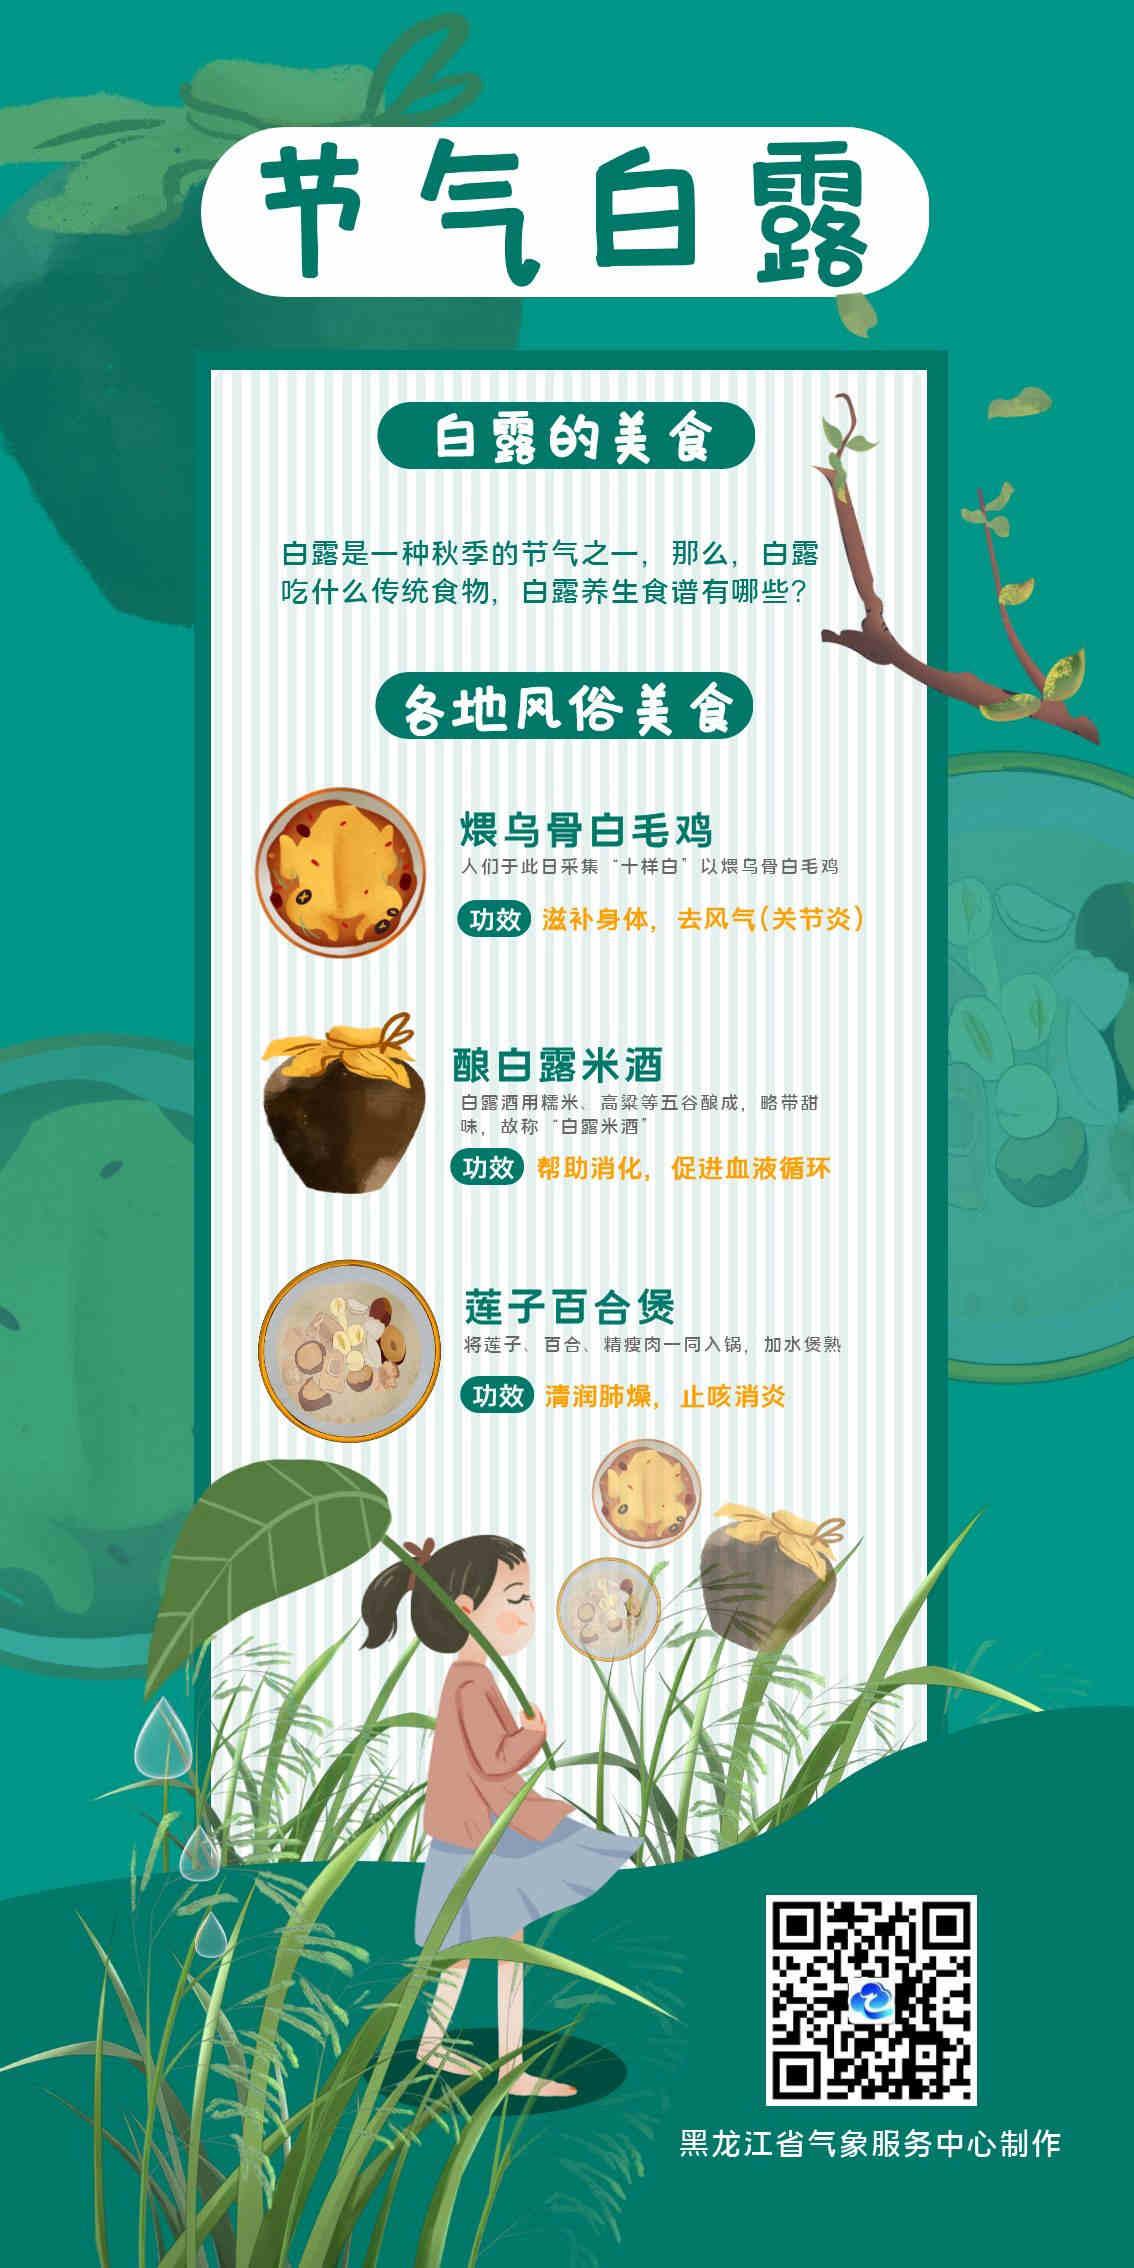 http://i.weather.com.cn/images/heilongjiang/gdt/2020/09/11/1599793360620044439.jpg